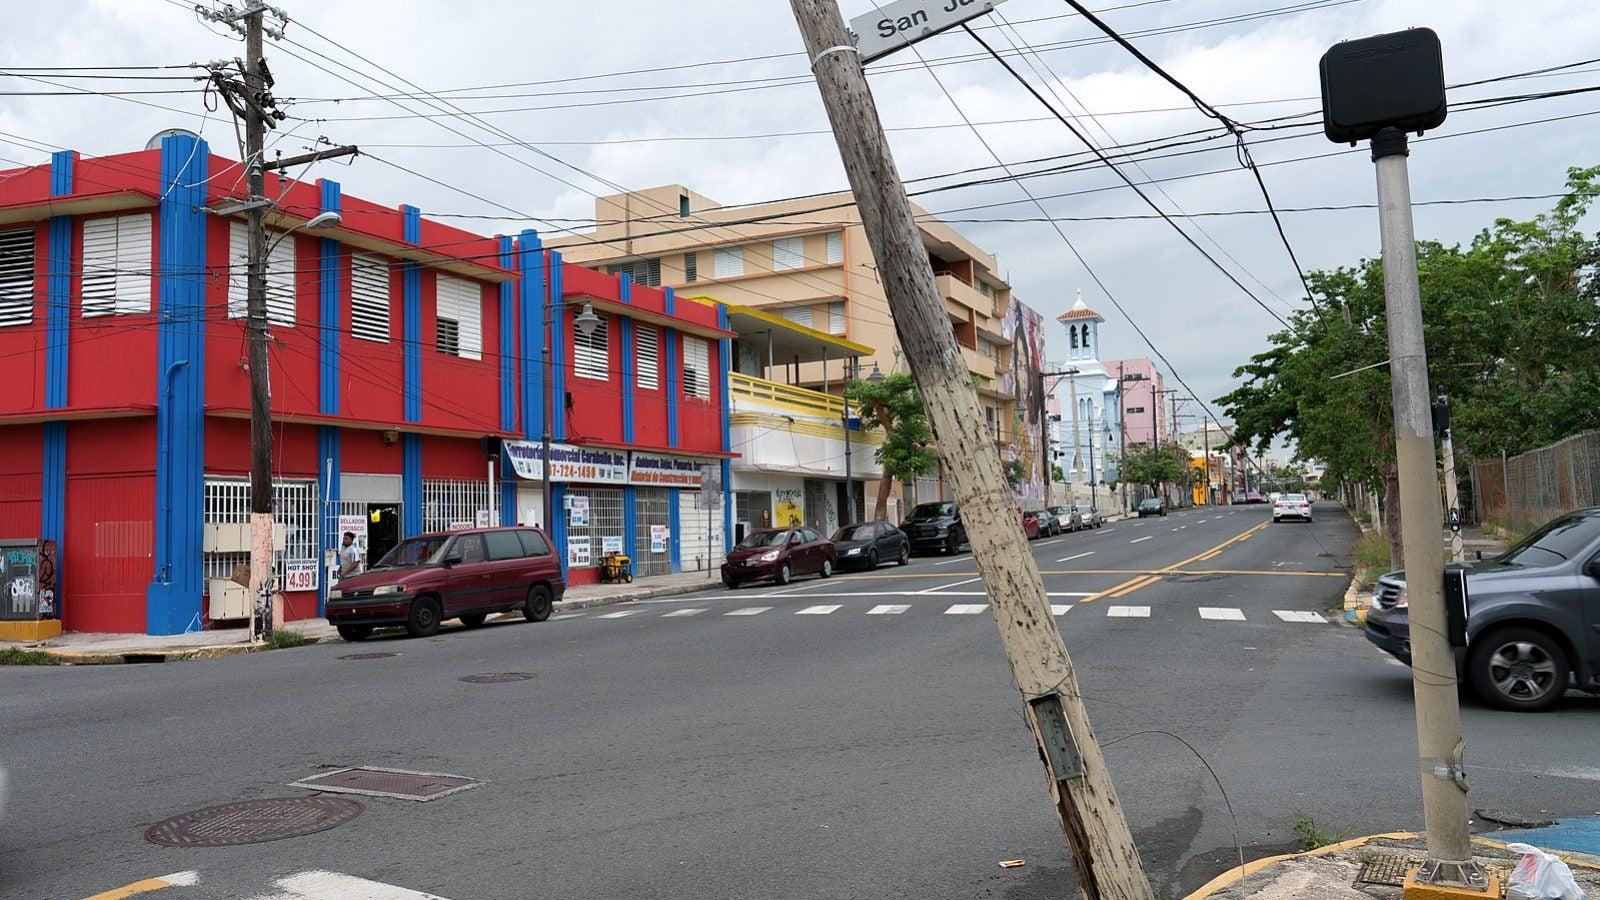 Puerto Rican street after Hurricane Maria